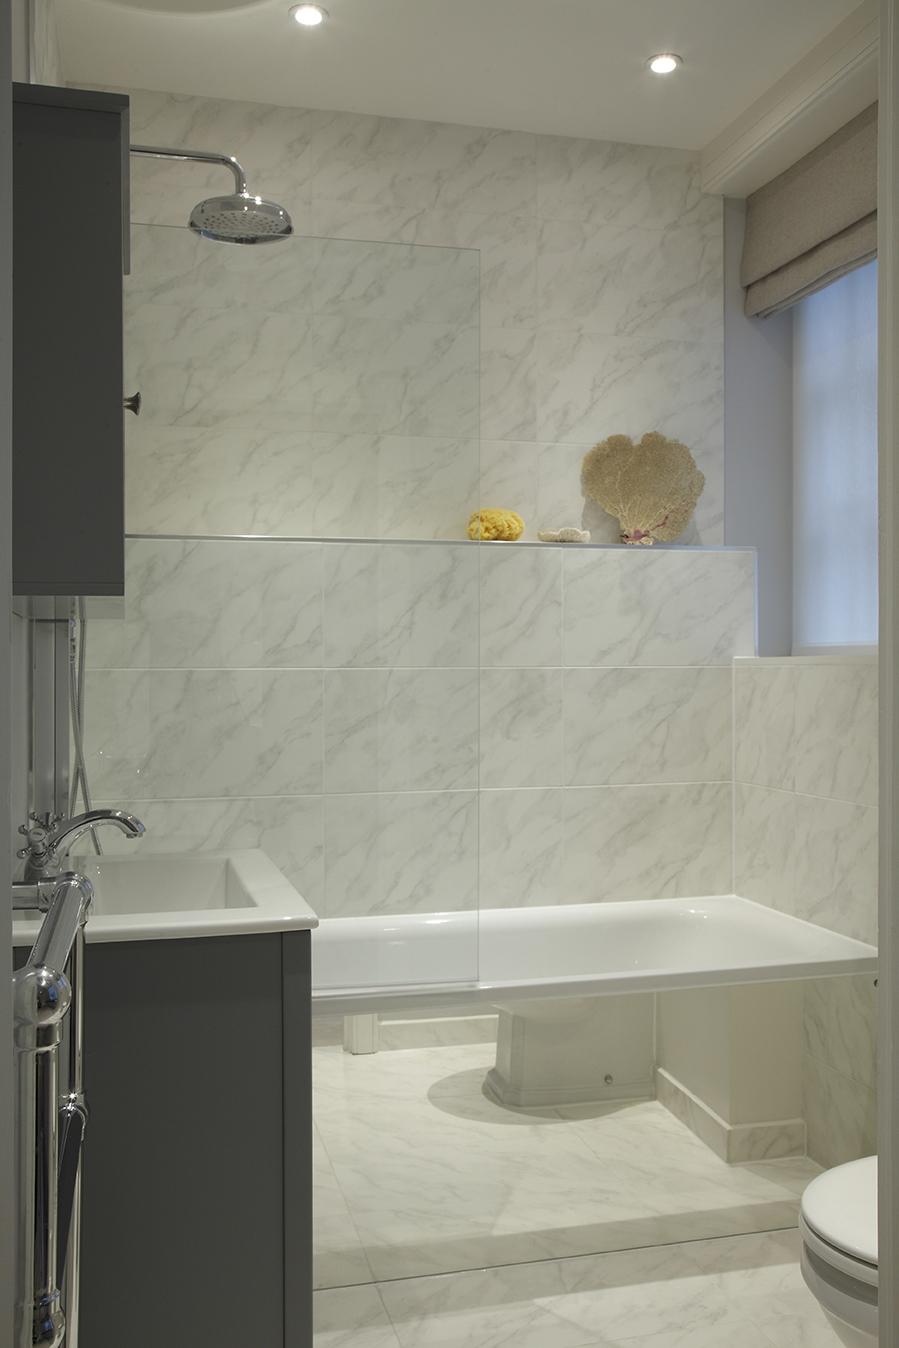 NW1 - Ensuite bathroom - Angled shot displaying the roman blind .jpg